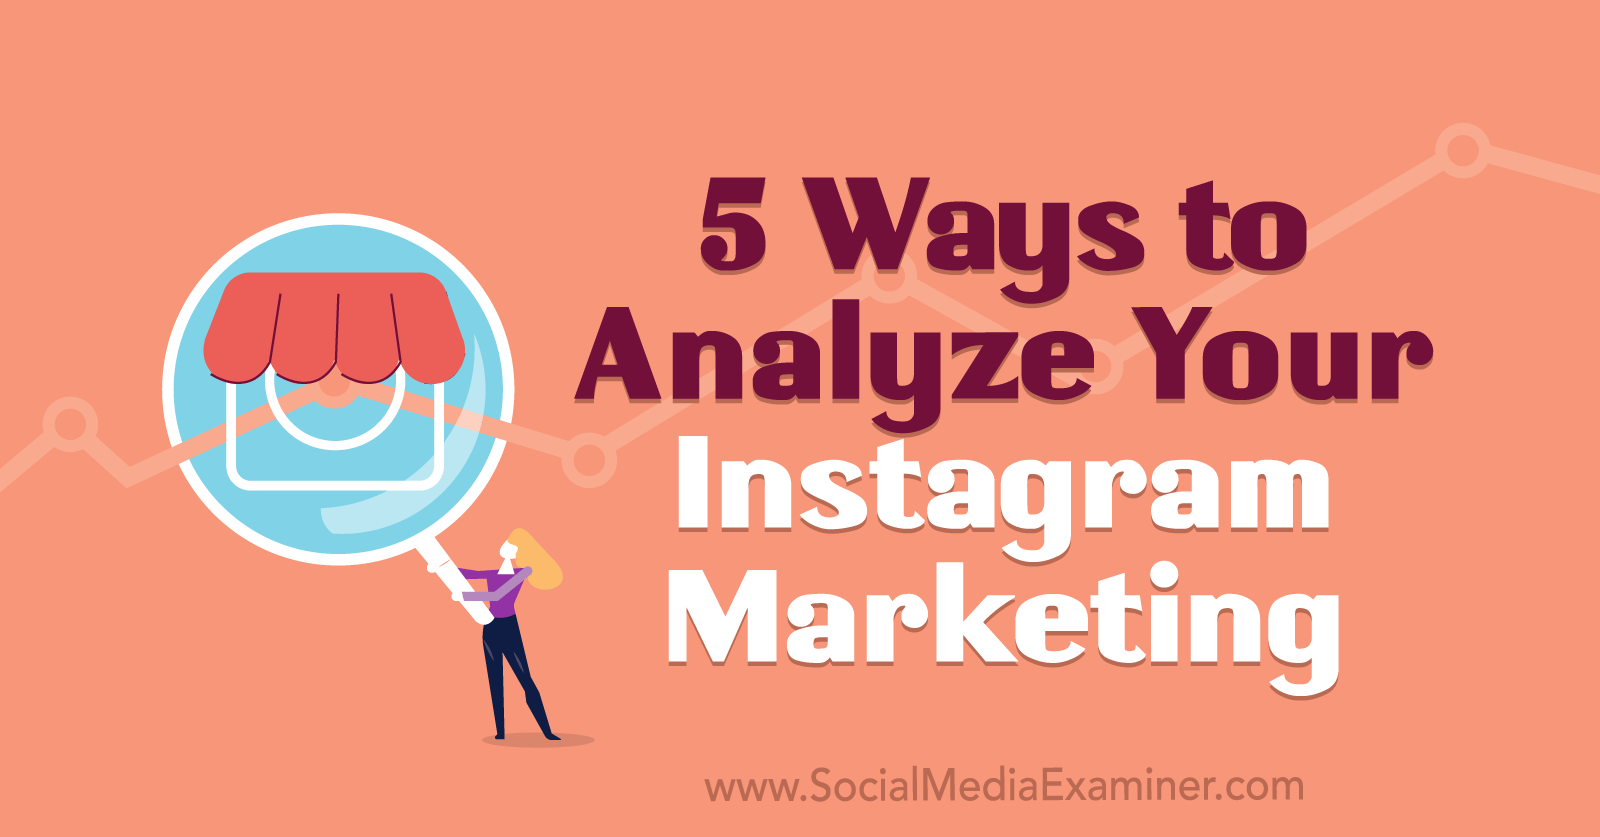 5 ways to improve your instagram marketing social media examiner 5 Ways To Analyze Your Instagram Marketing Social Media Examiner